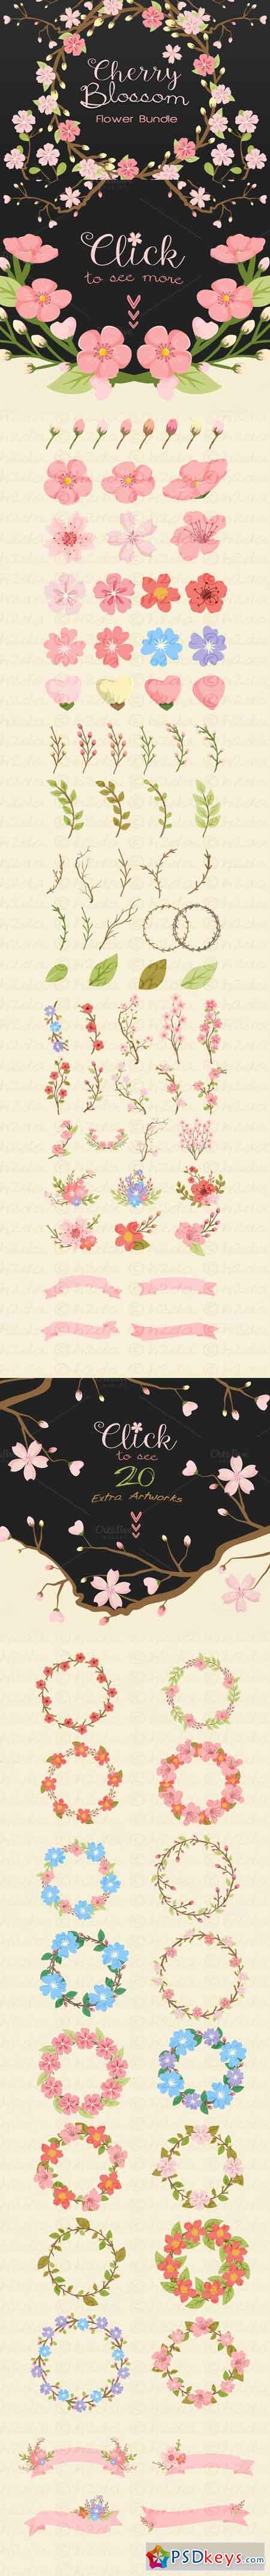 Cherry Blossom - Sakura 586234